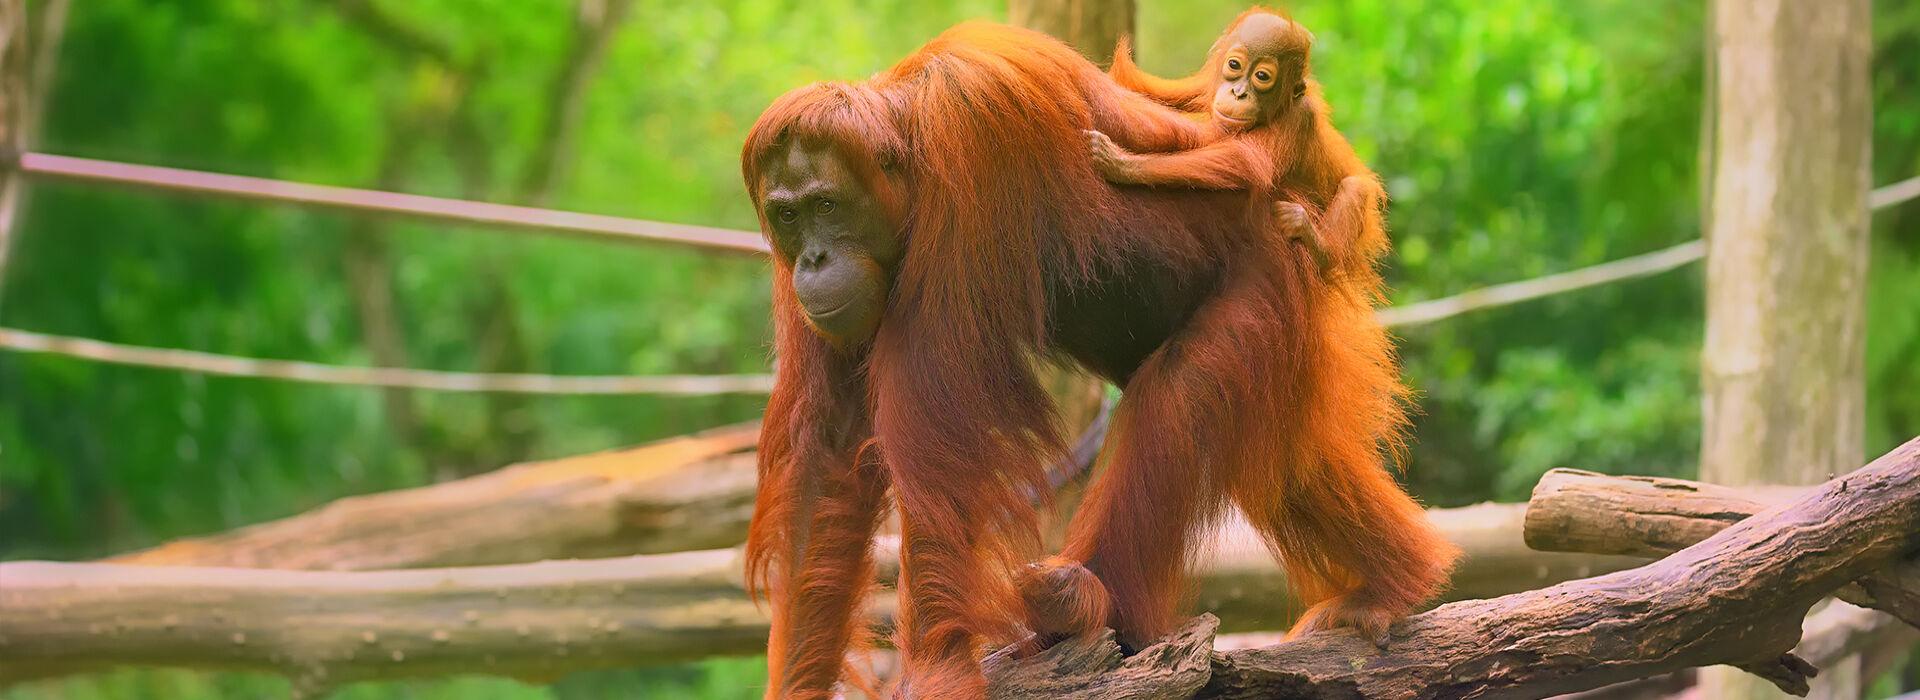 Volunteer On The Samboja Lestari Orangutan Volunteer Project